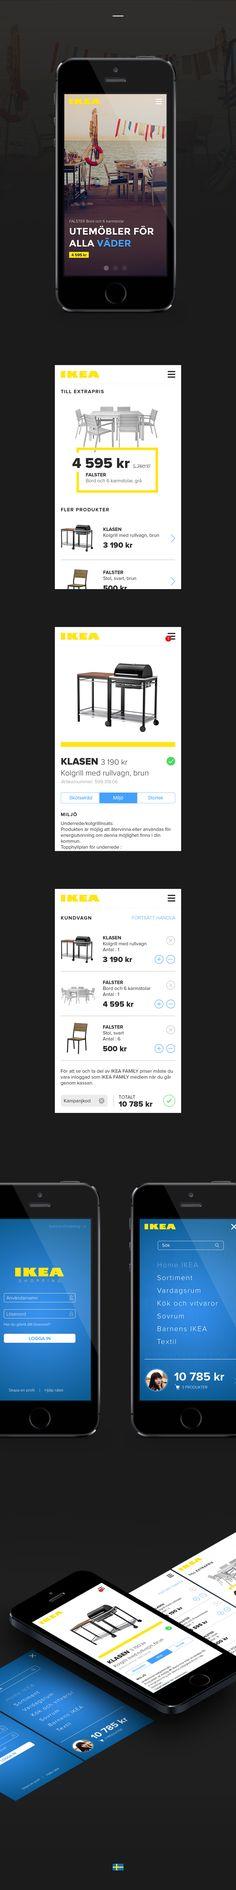 IKEA #Mobile #App Redesign Concept